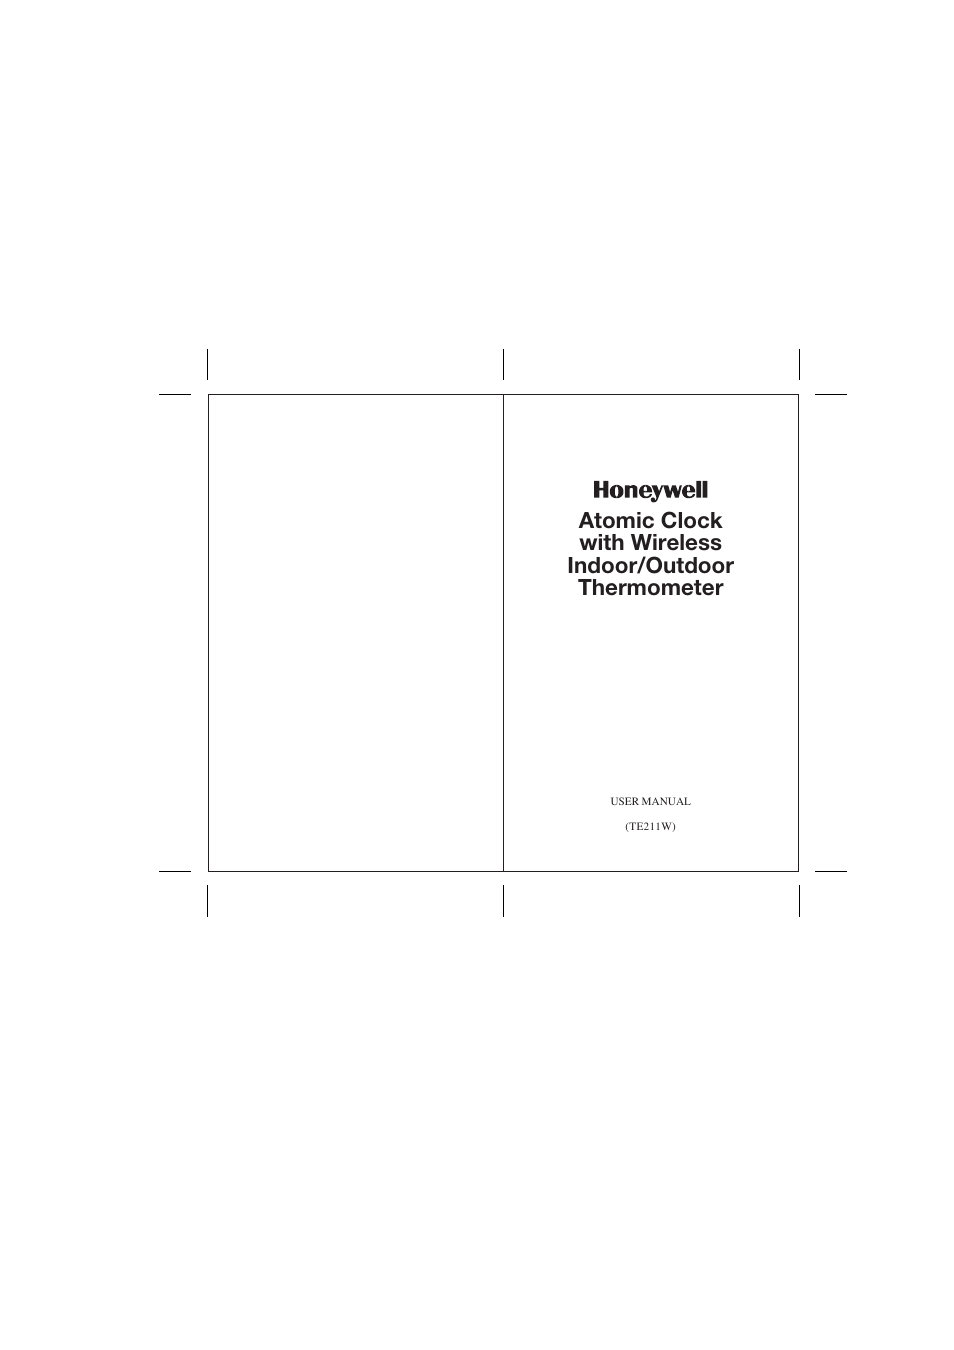 honeywell atomic clock manual